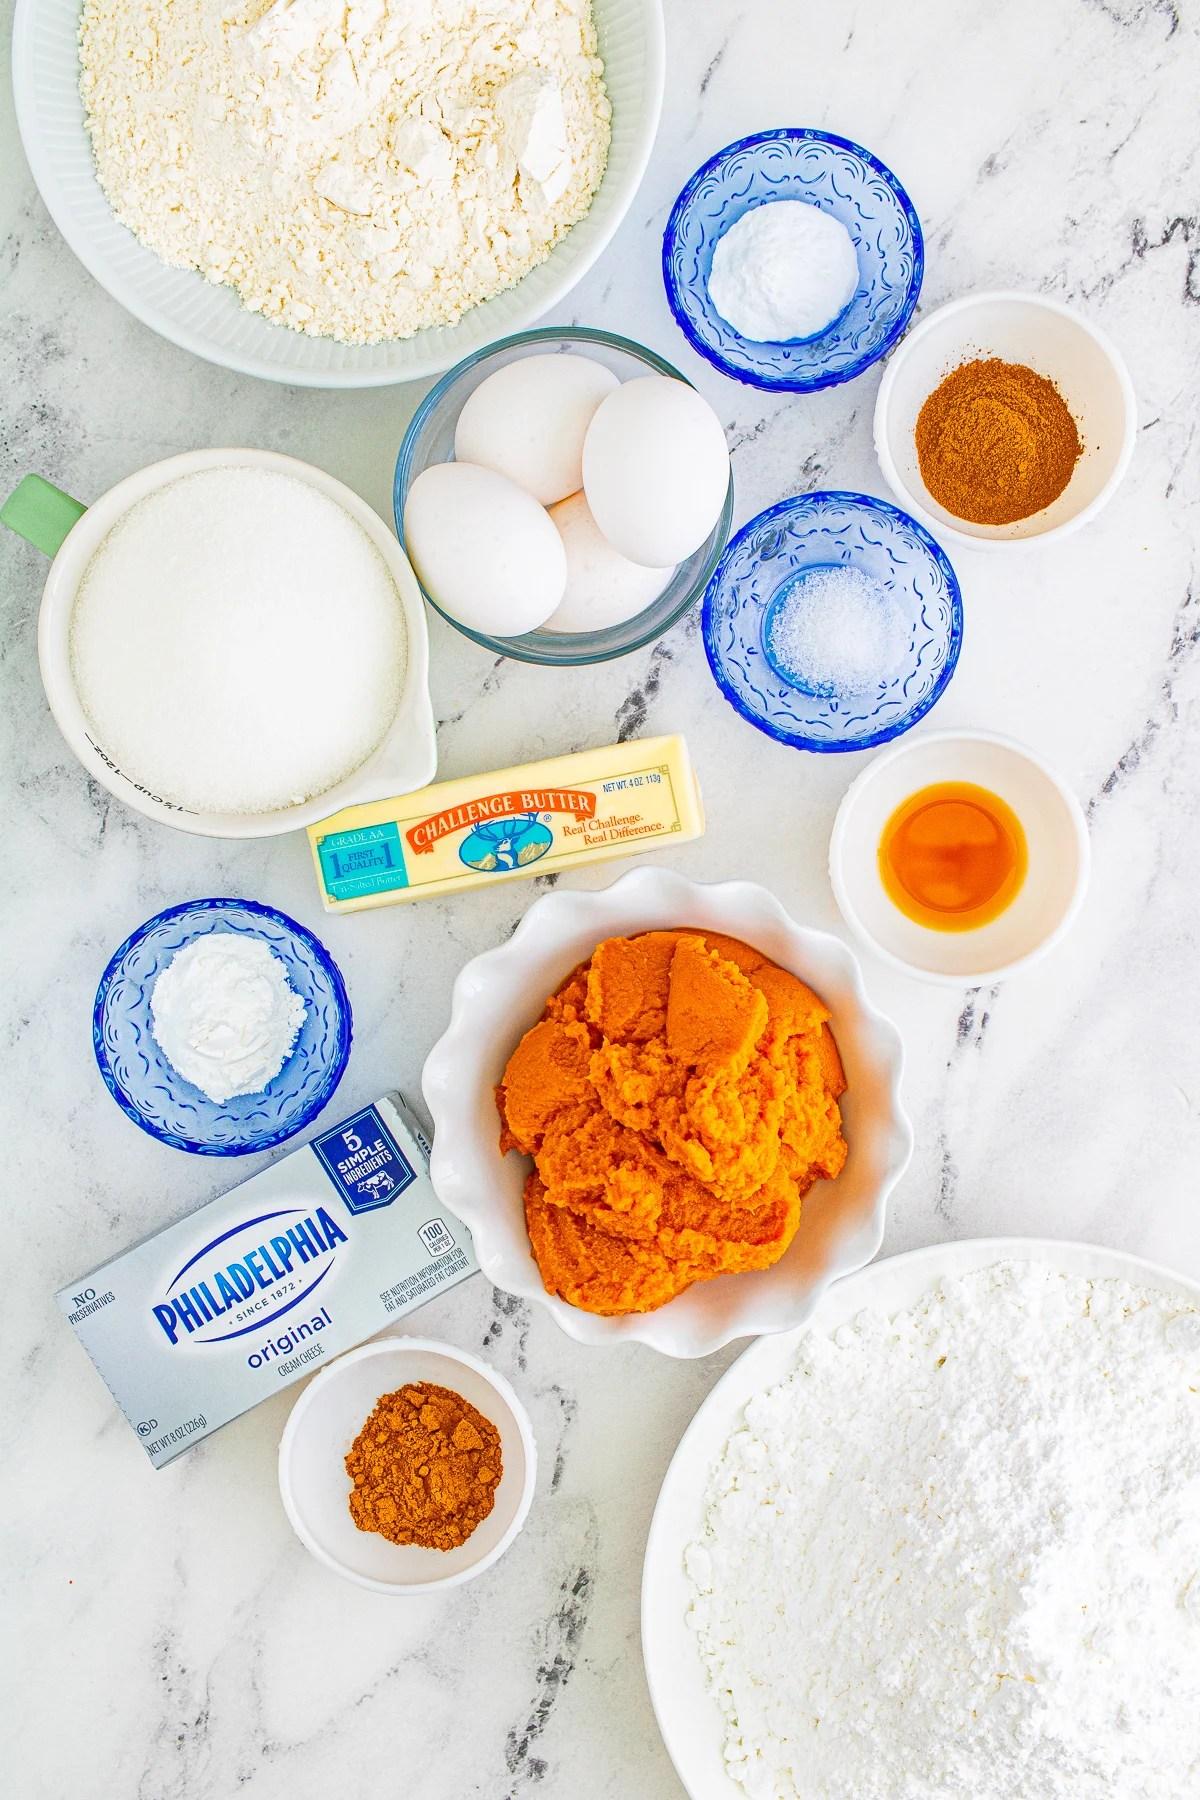 Ingredients needed to make a Pumpki Bar Recipe.